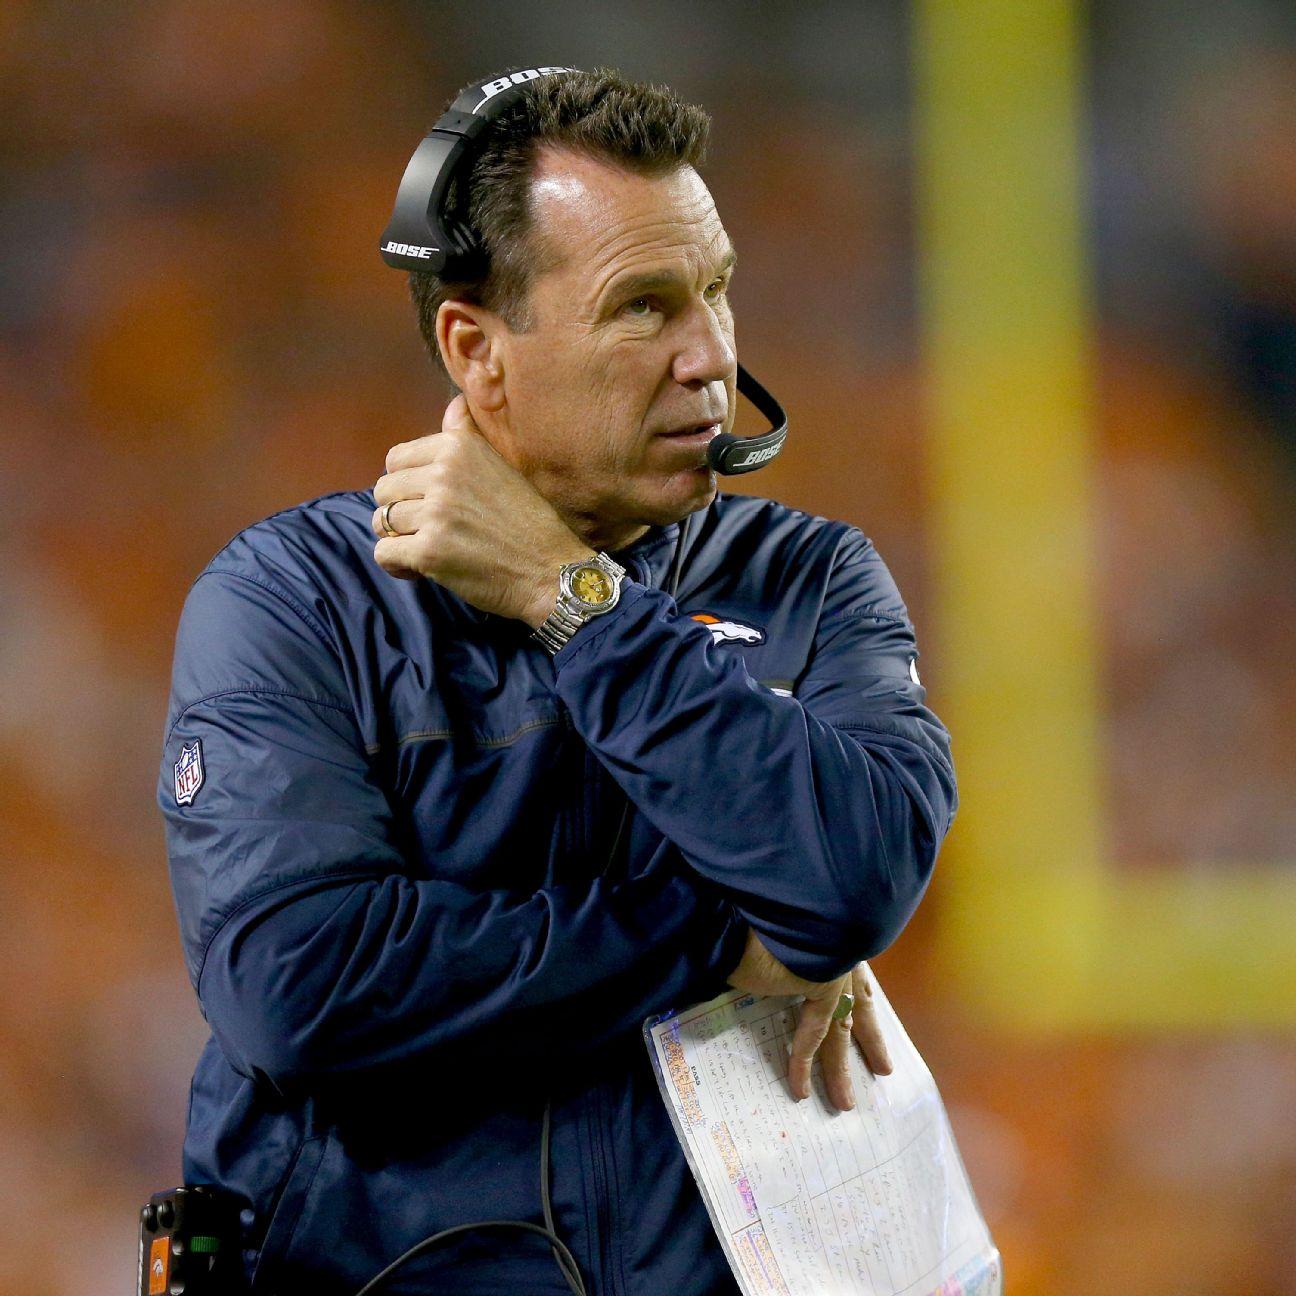 Denver Broncos Coach Gary Kubiak In Hospital With 'flu